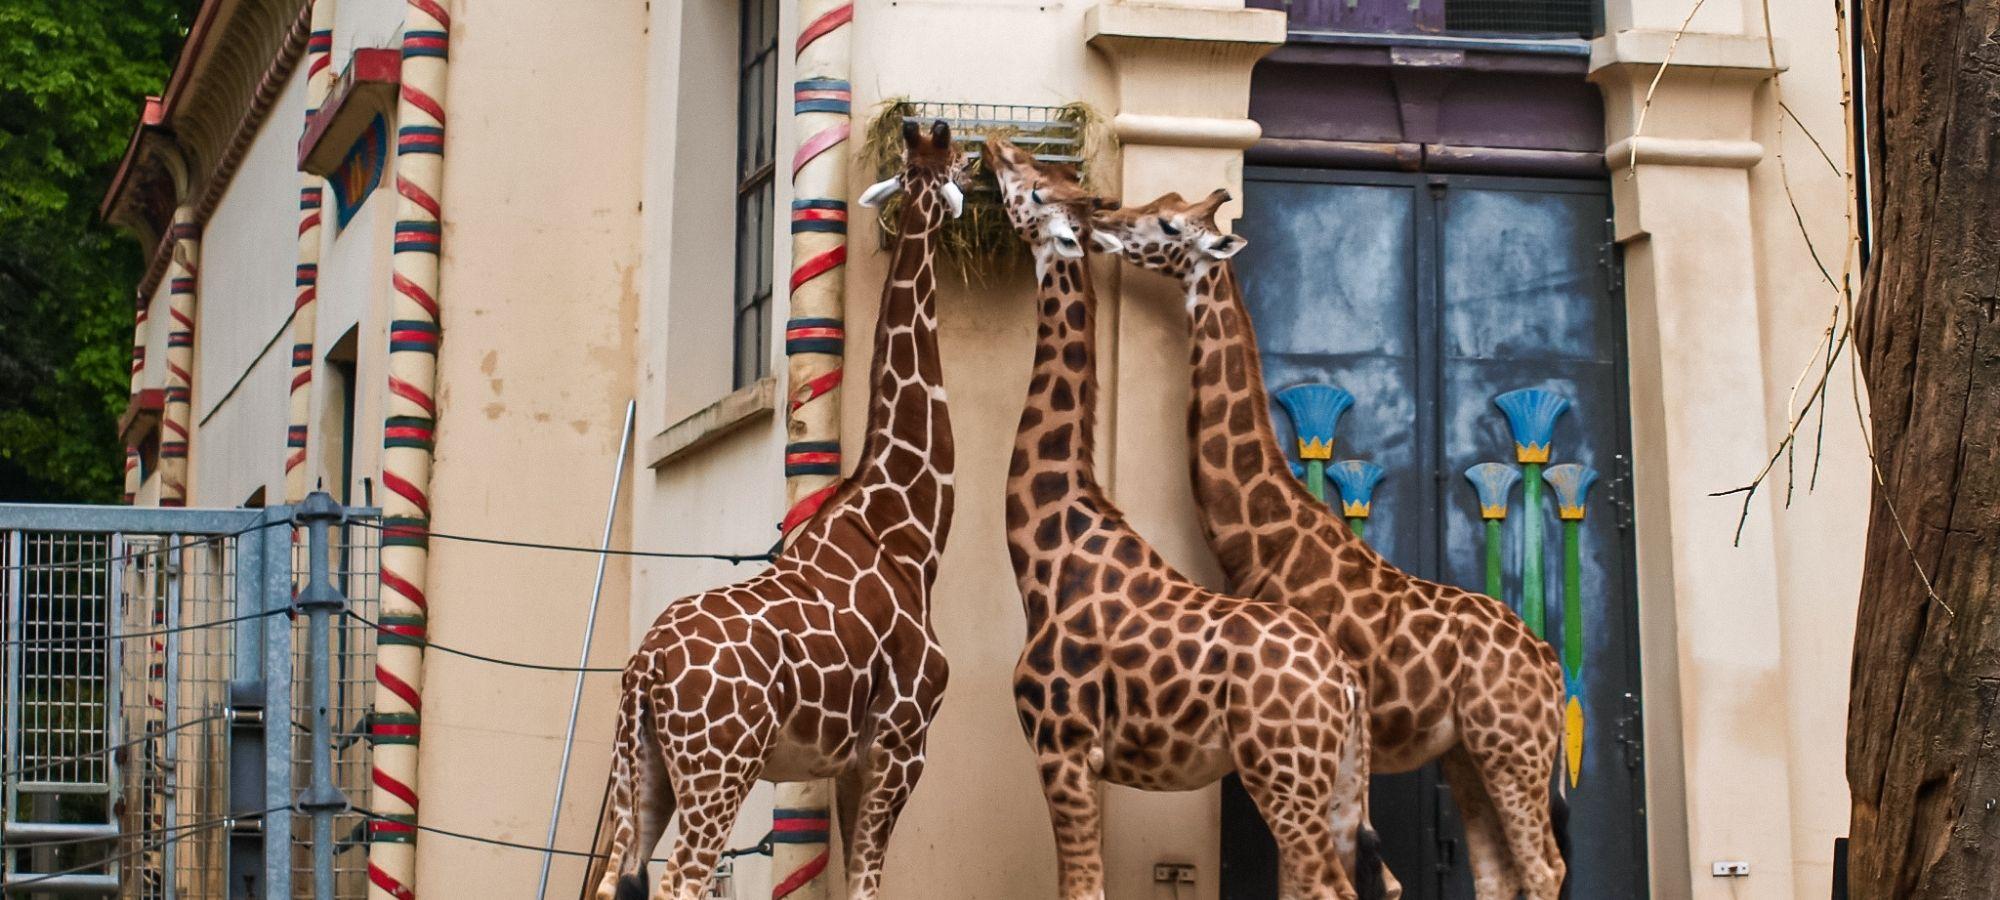 3 giraffes eating in an African themed zoo enclosure, Belgium